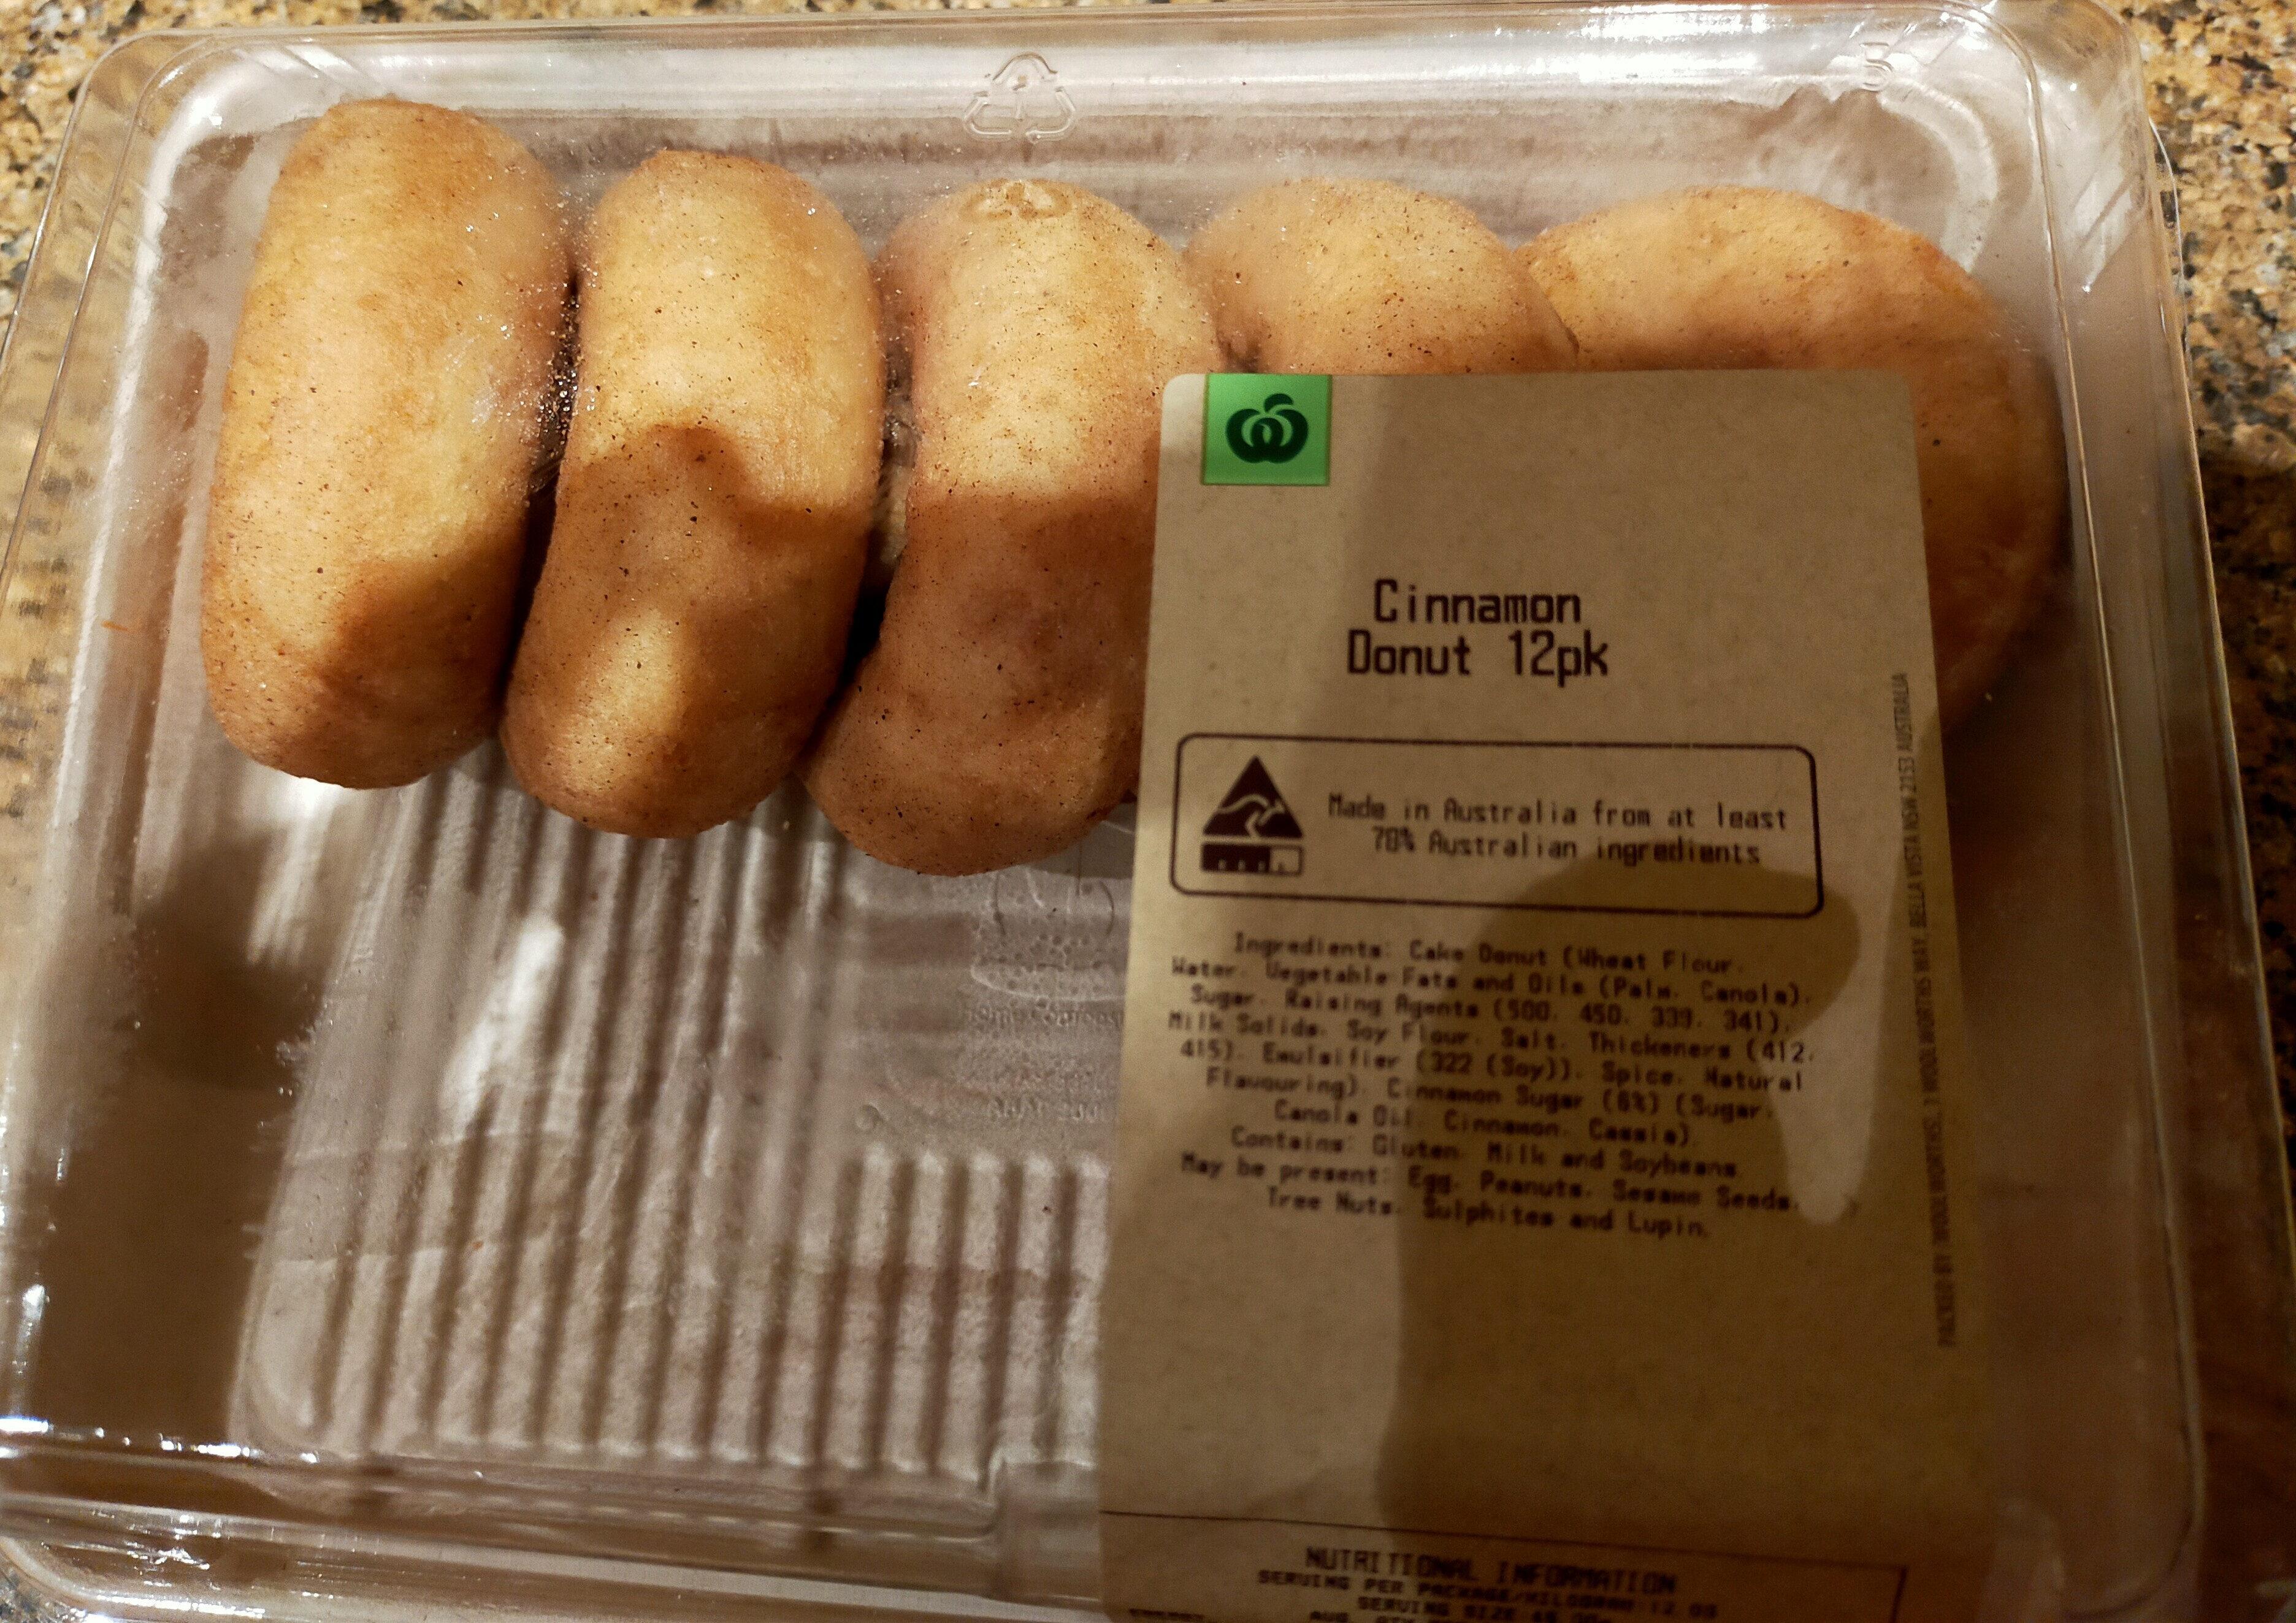 Cinnamon Donut 12pk - Produit - en